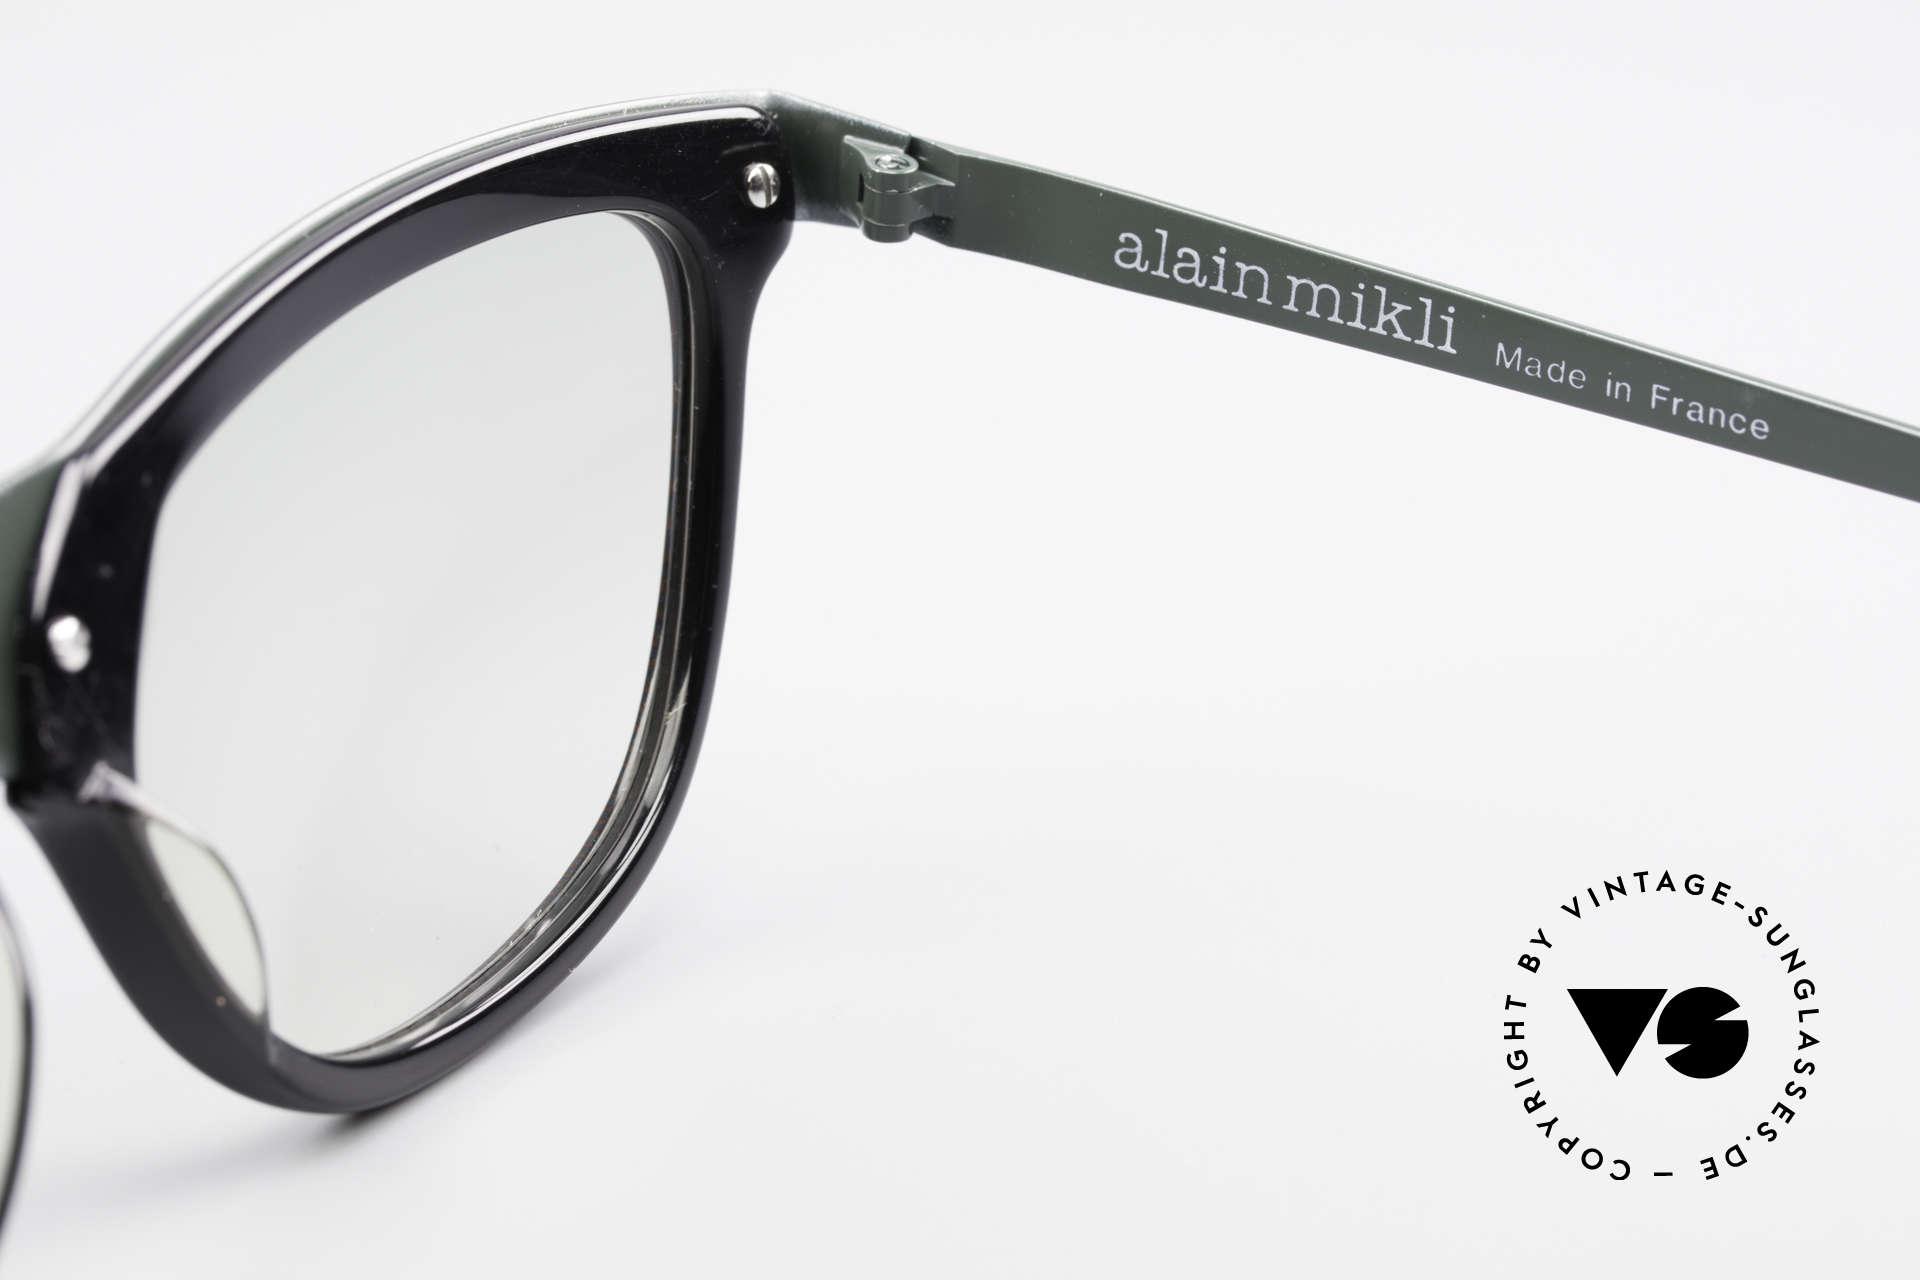 Alain Mikli 624 / 836 Hologram Effect Sunglasses, unworn NOS rarity from 1989 (NO RETRO sunglasses), Made for Women